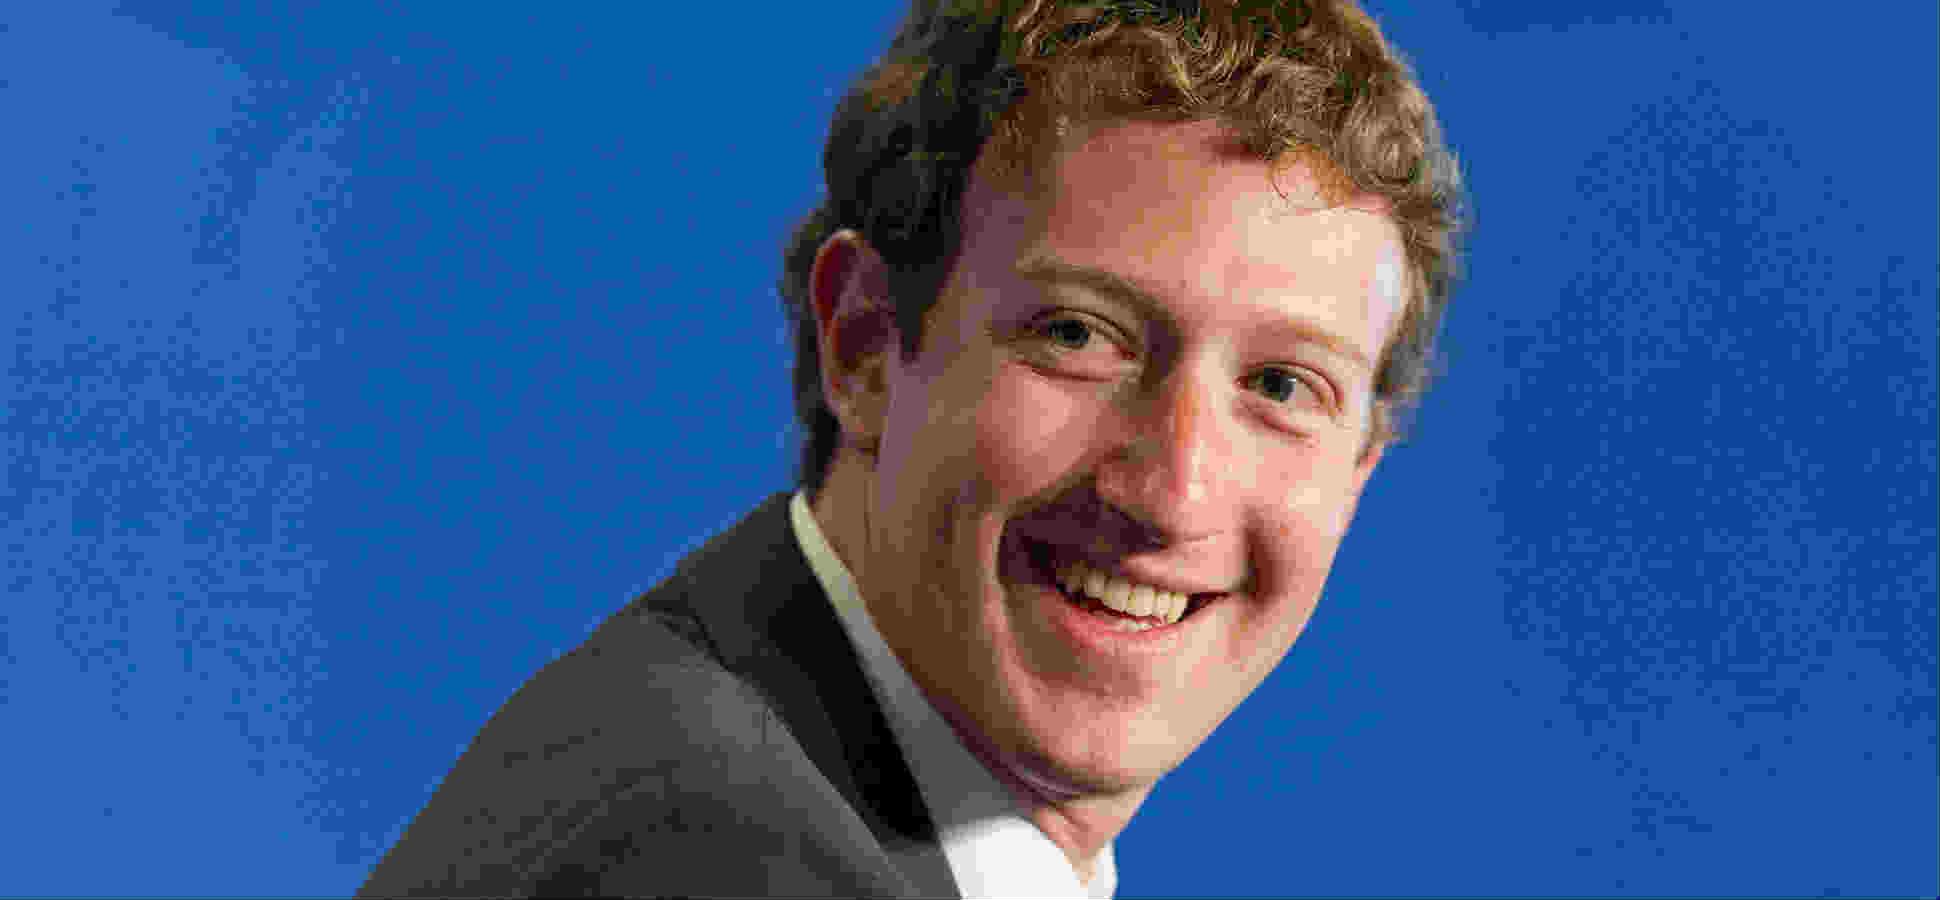 mark-zuckerberg-facebook-ceo_37502